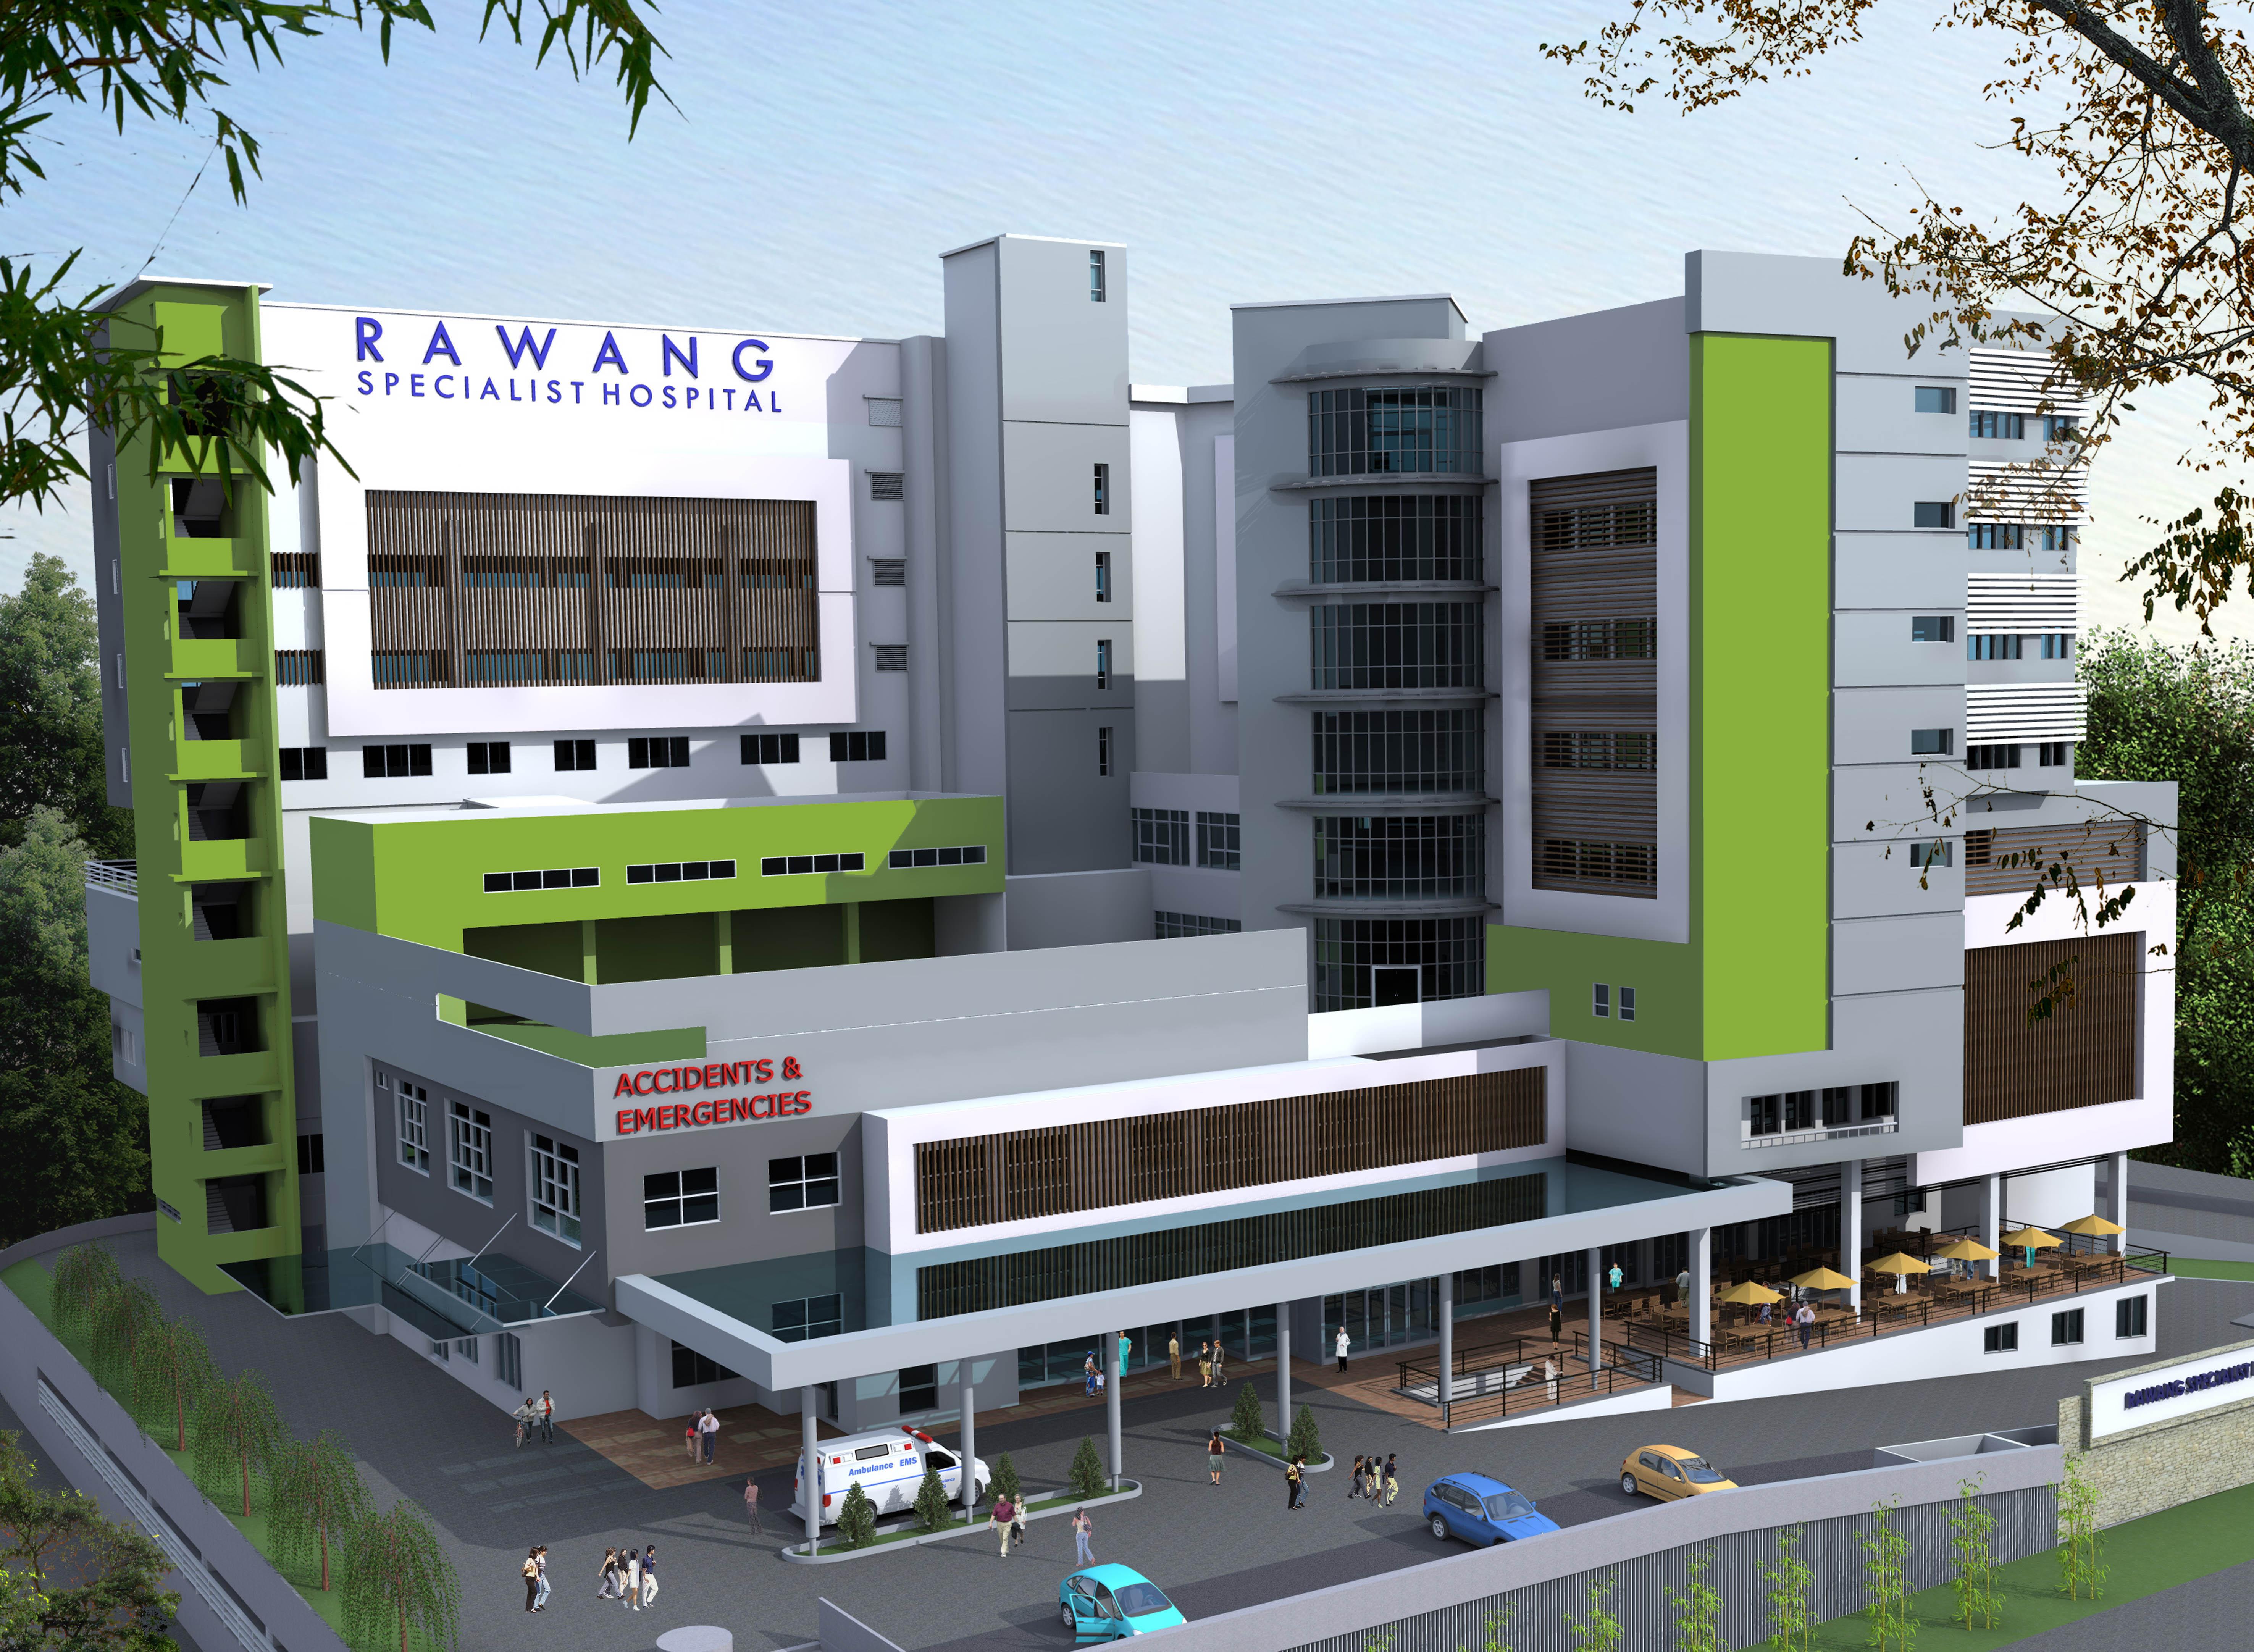 Rawang Specialist Hospital